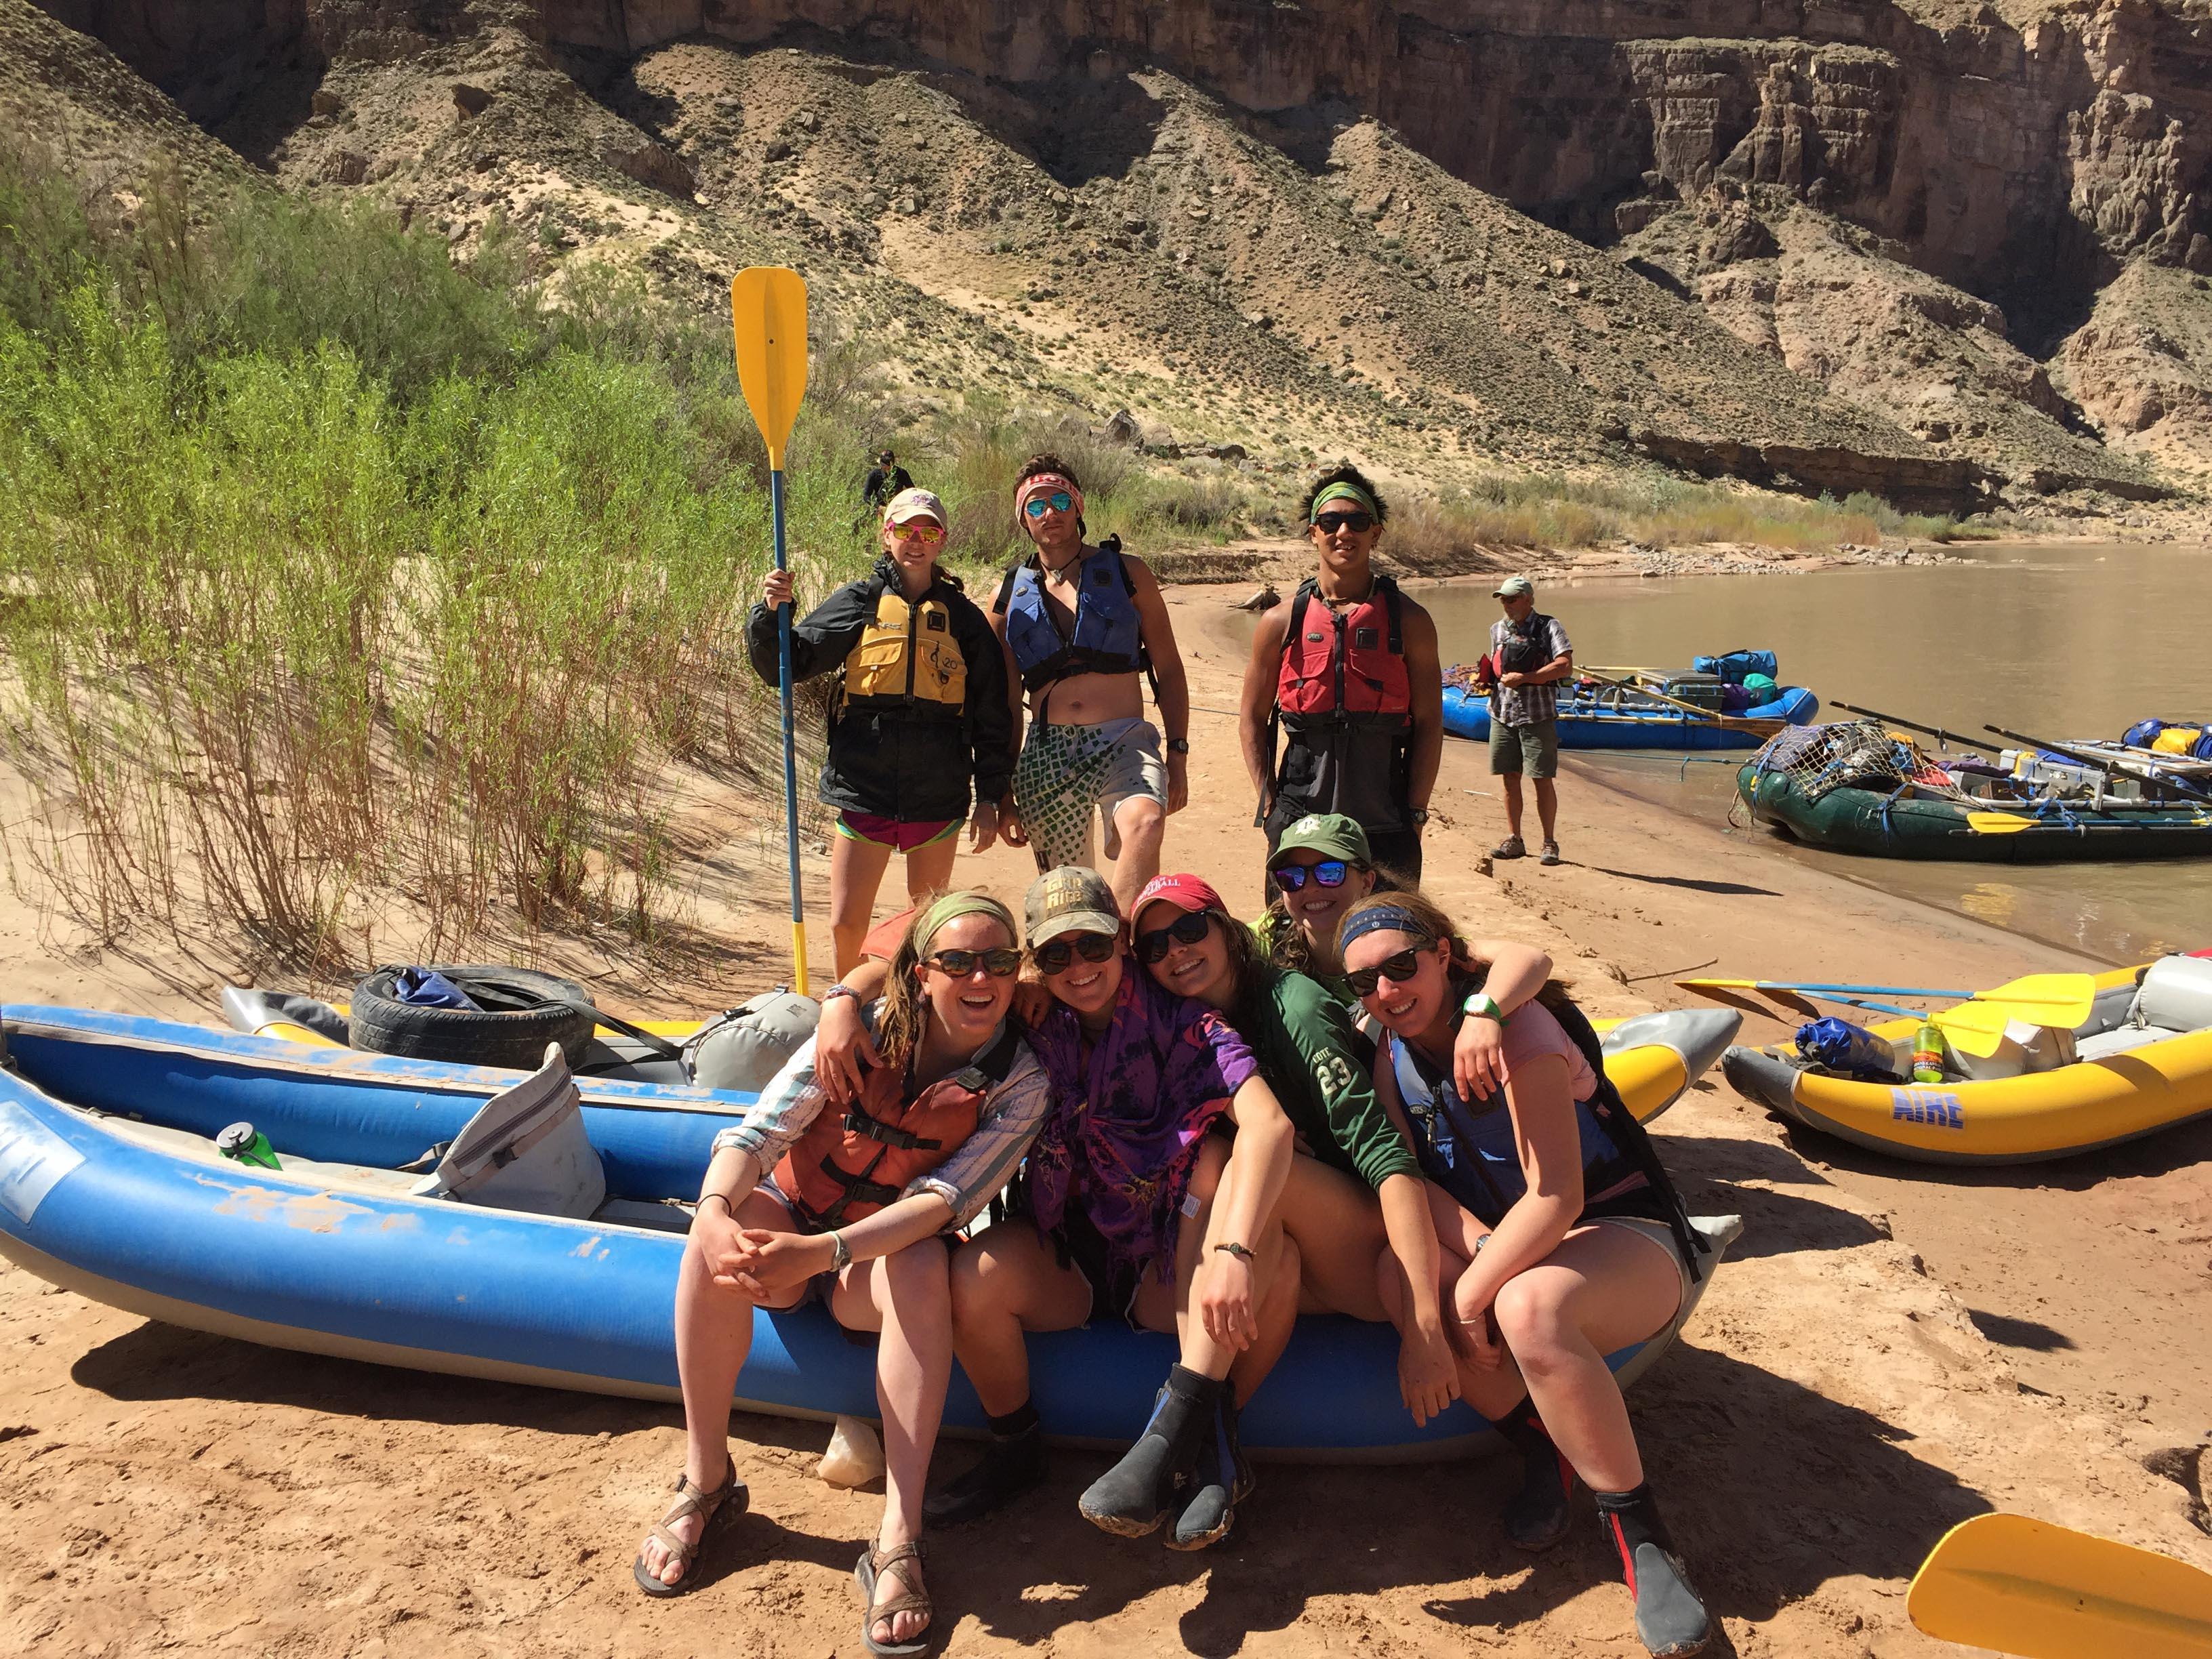 Proctor Academy Mountain Classroom Off-Campus Program